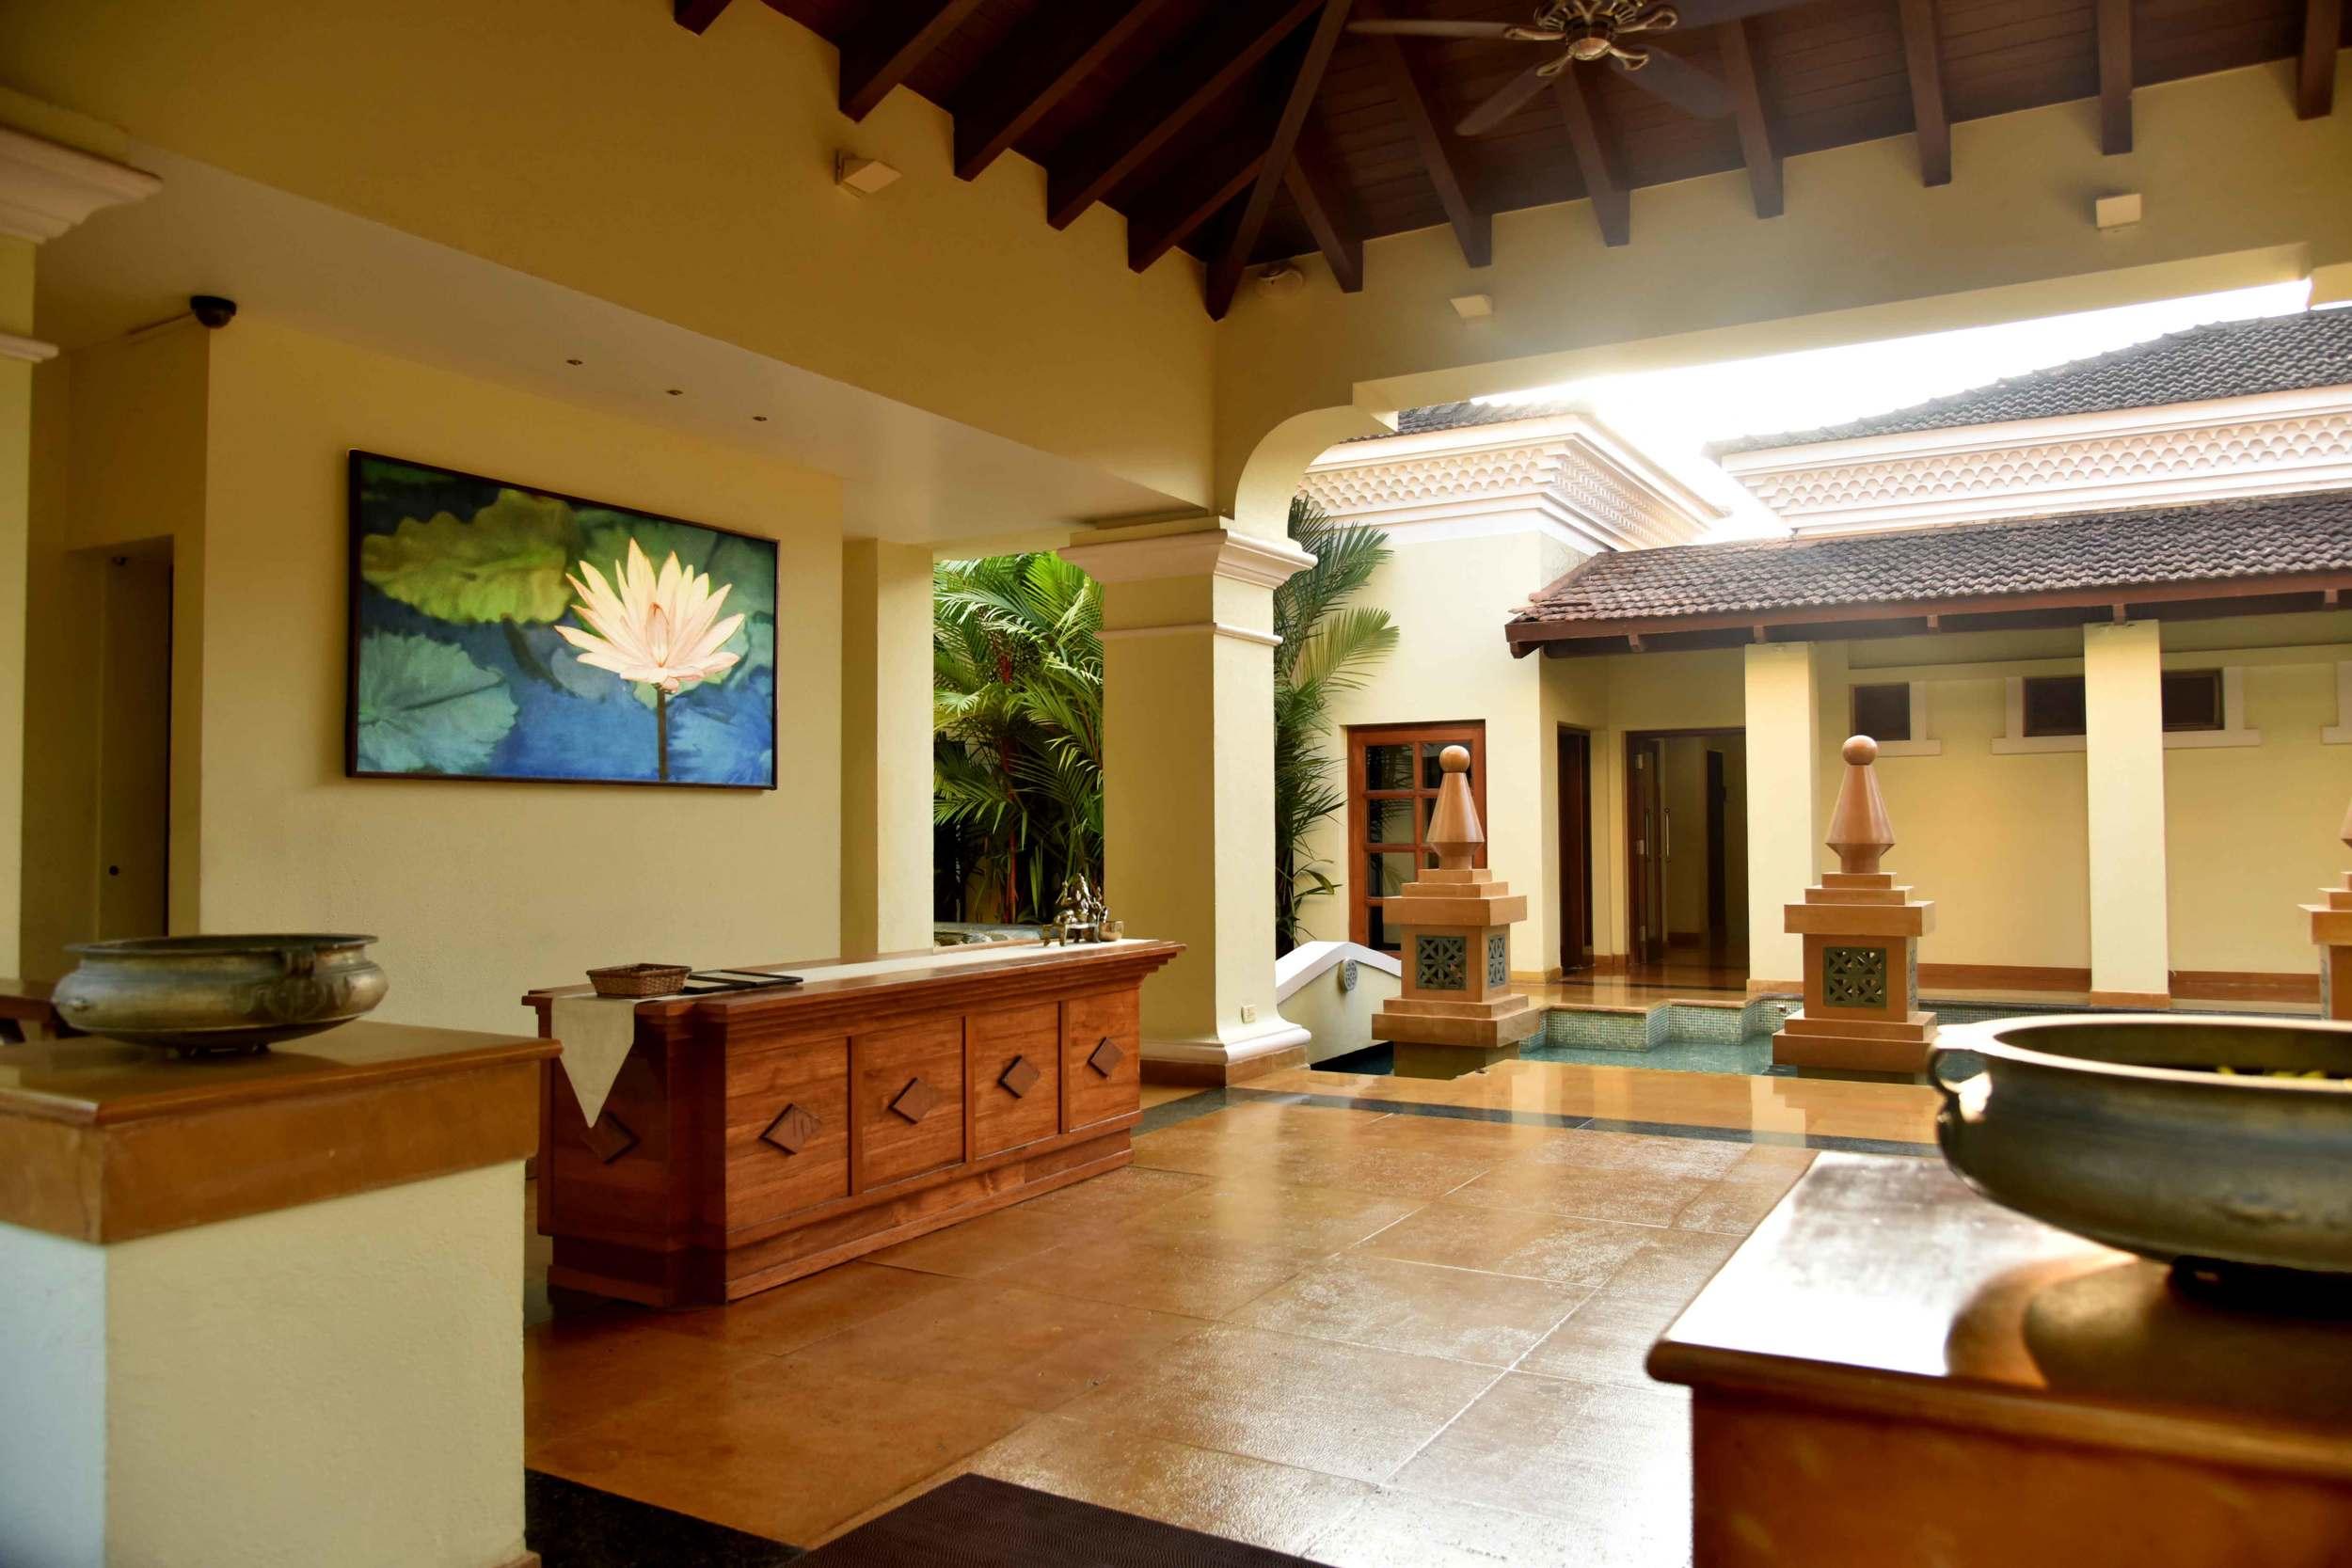 Spa at Park Hyatt, Goa, India, 5 star hotel, luxury beach resort, spa. Image©thingstodot.com